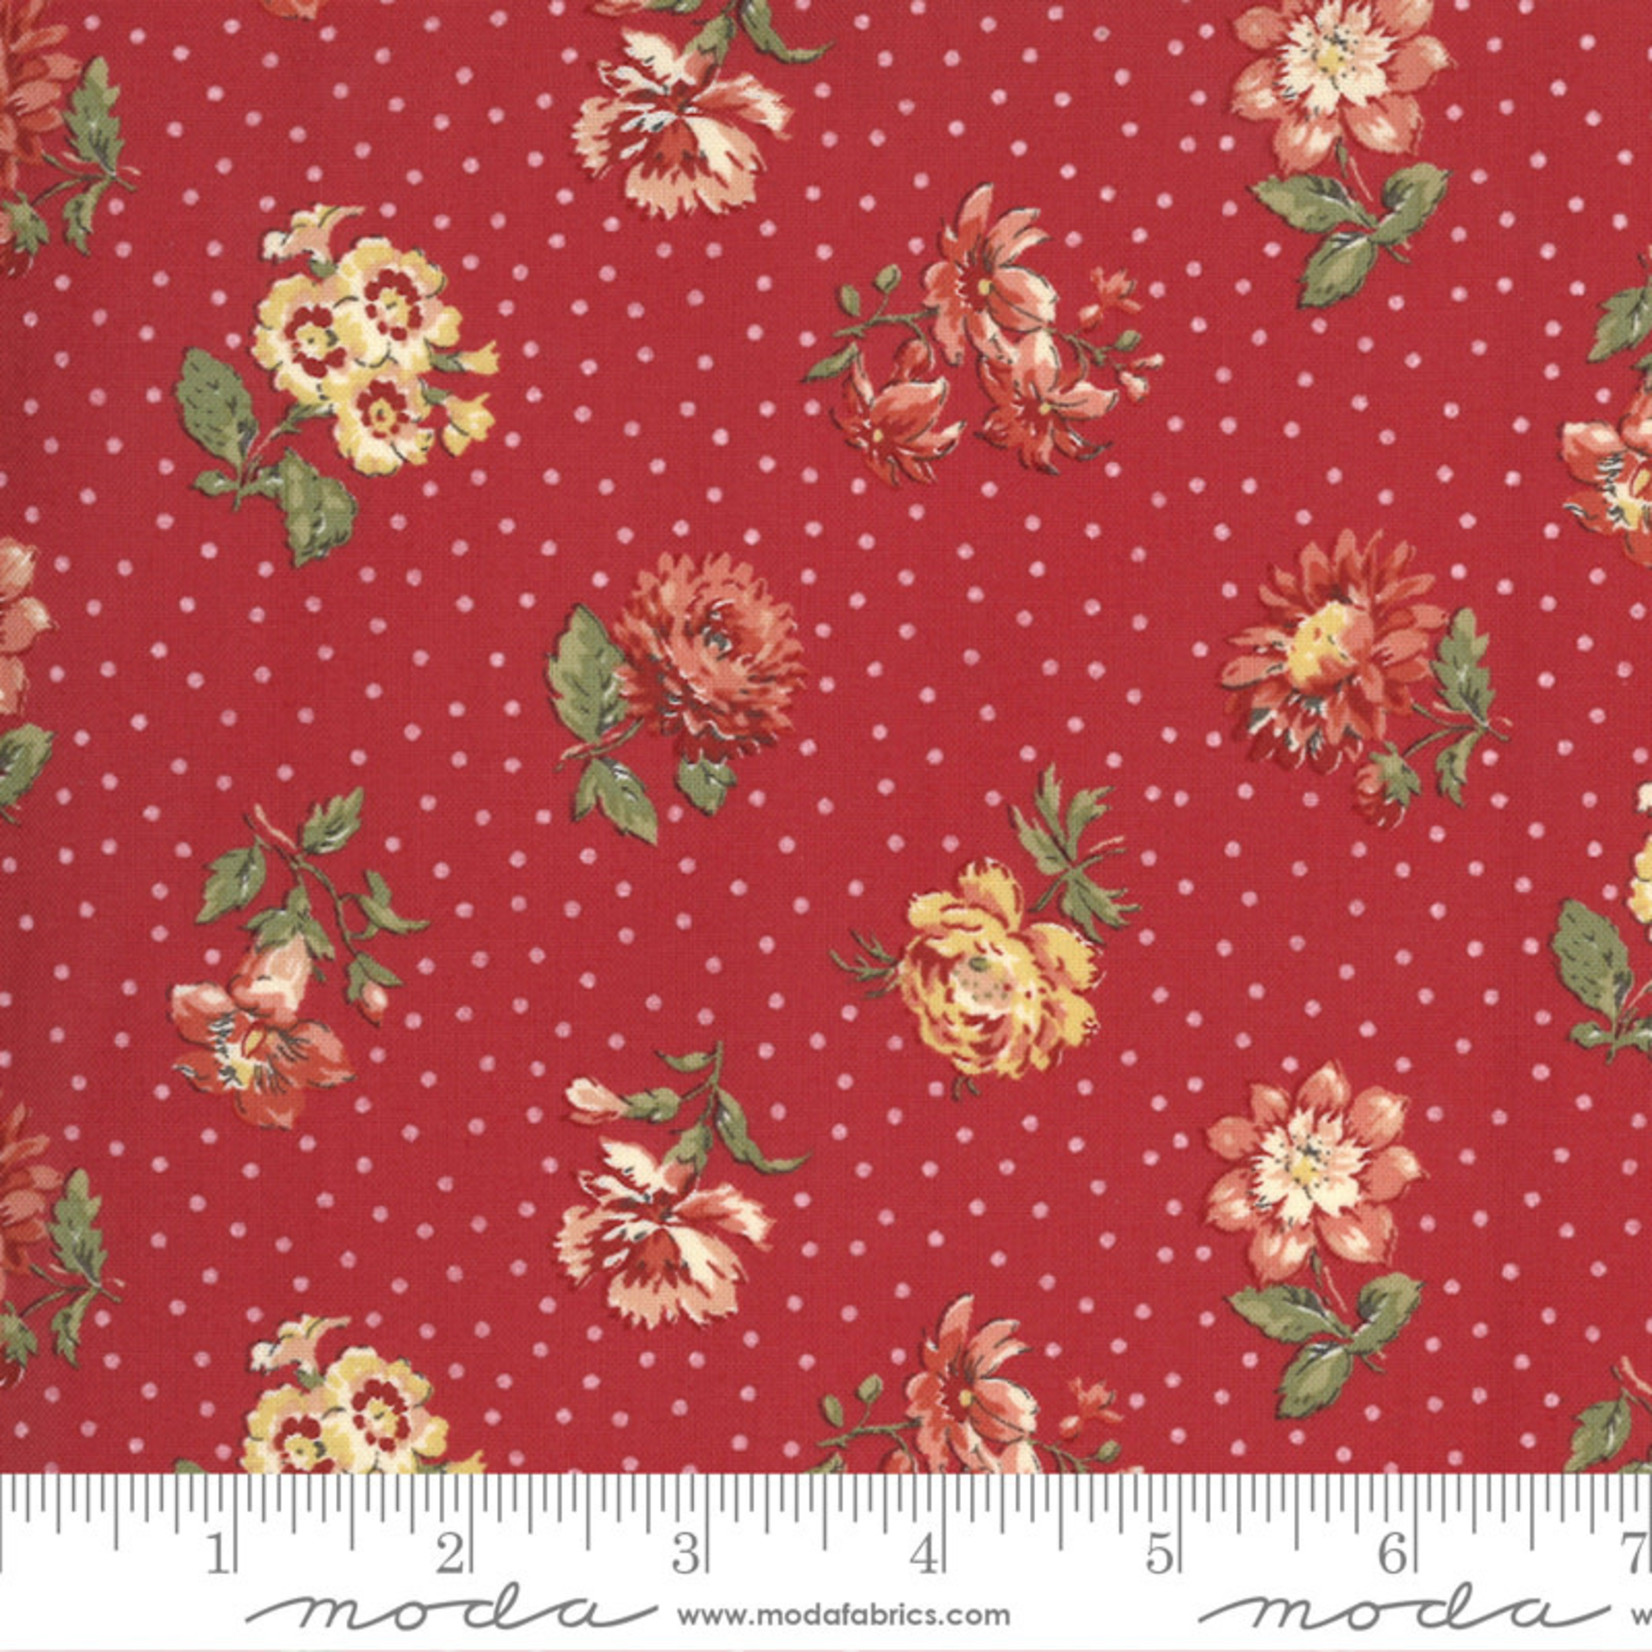 French General Jardins De Fleurs, Rayol, Rouge 13893-12 $0.20 per cm or $20/m